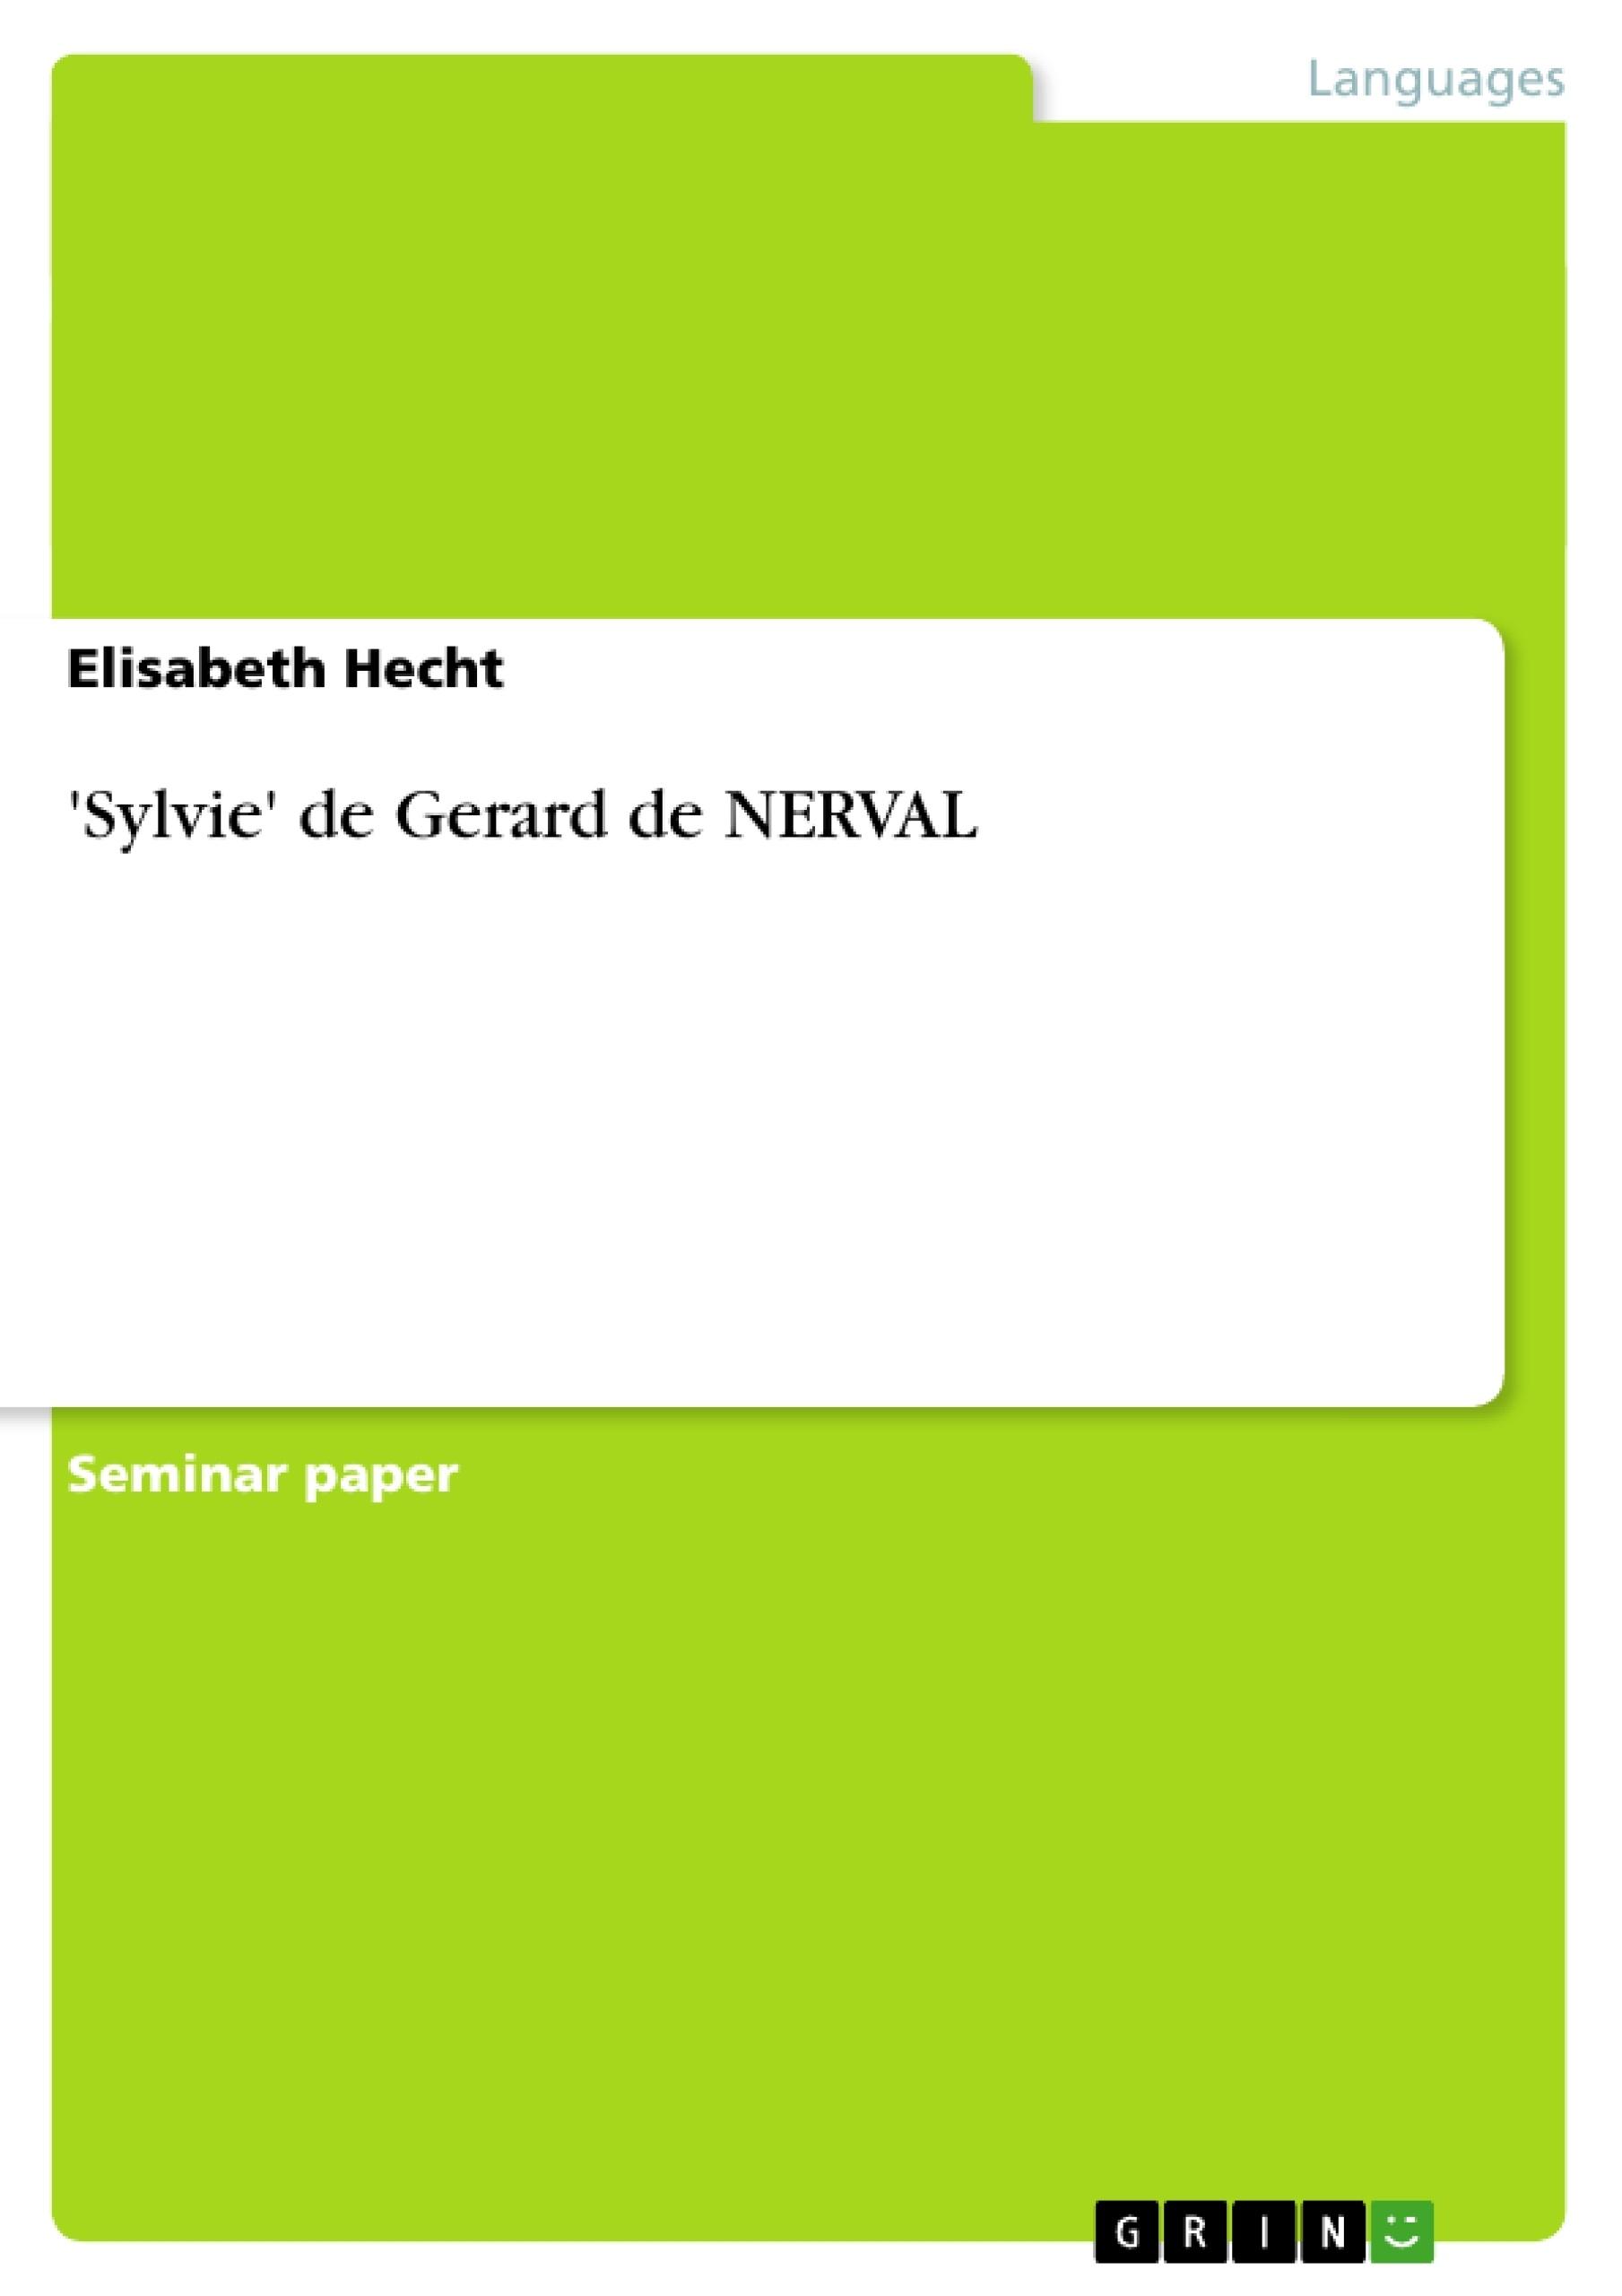 Titre: 'Sylvie' de Gerard de NERVAL